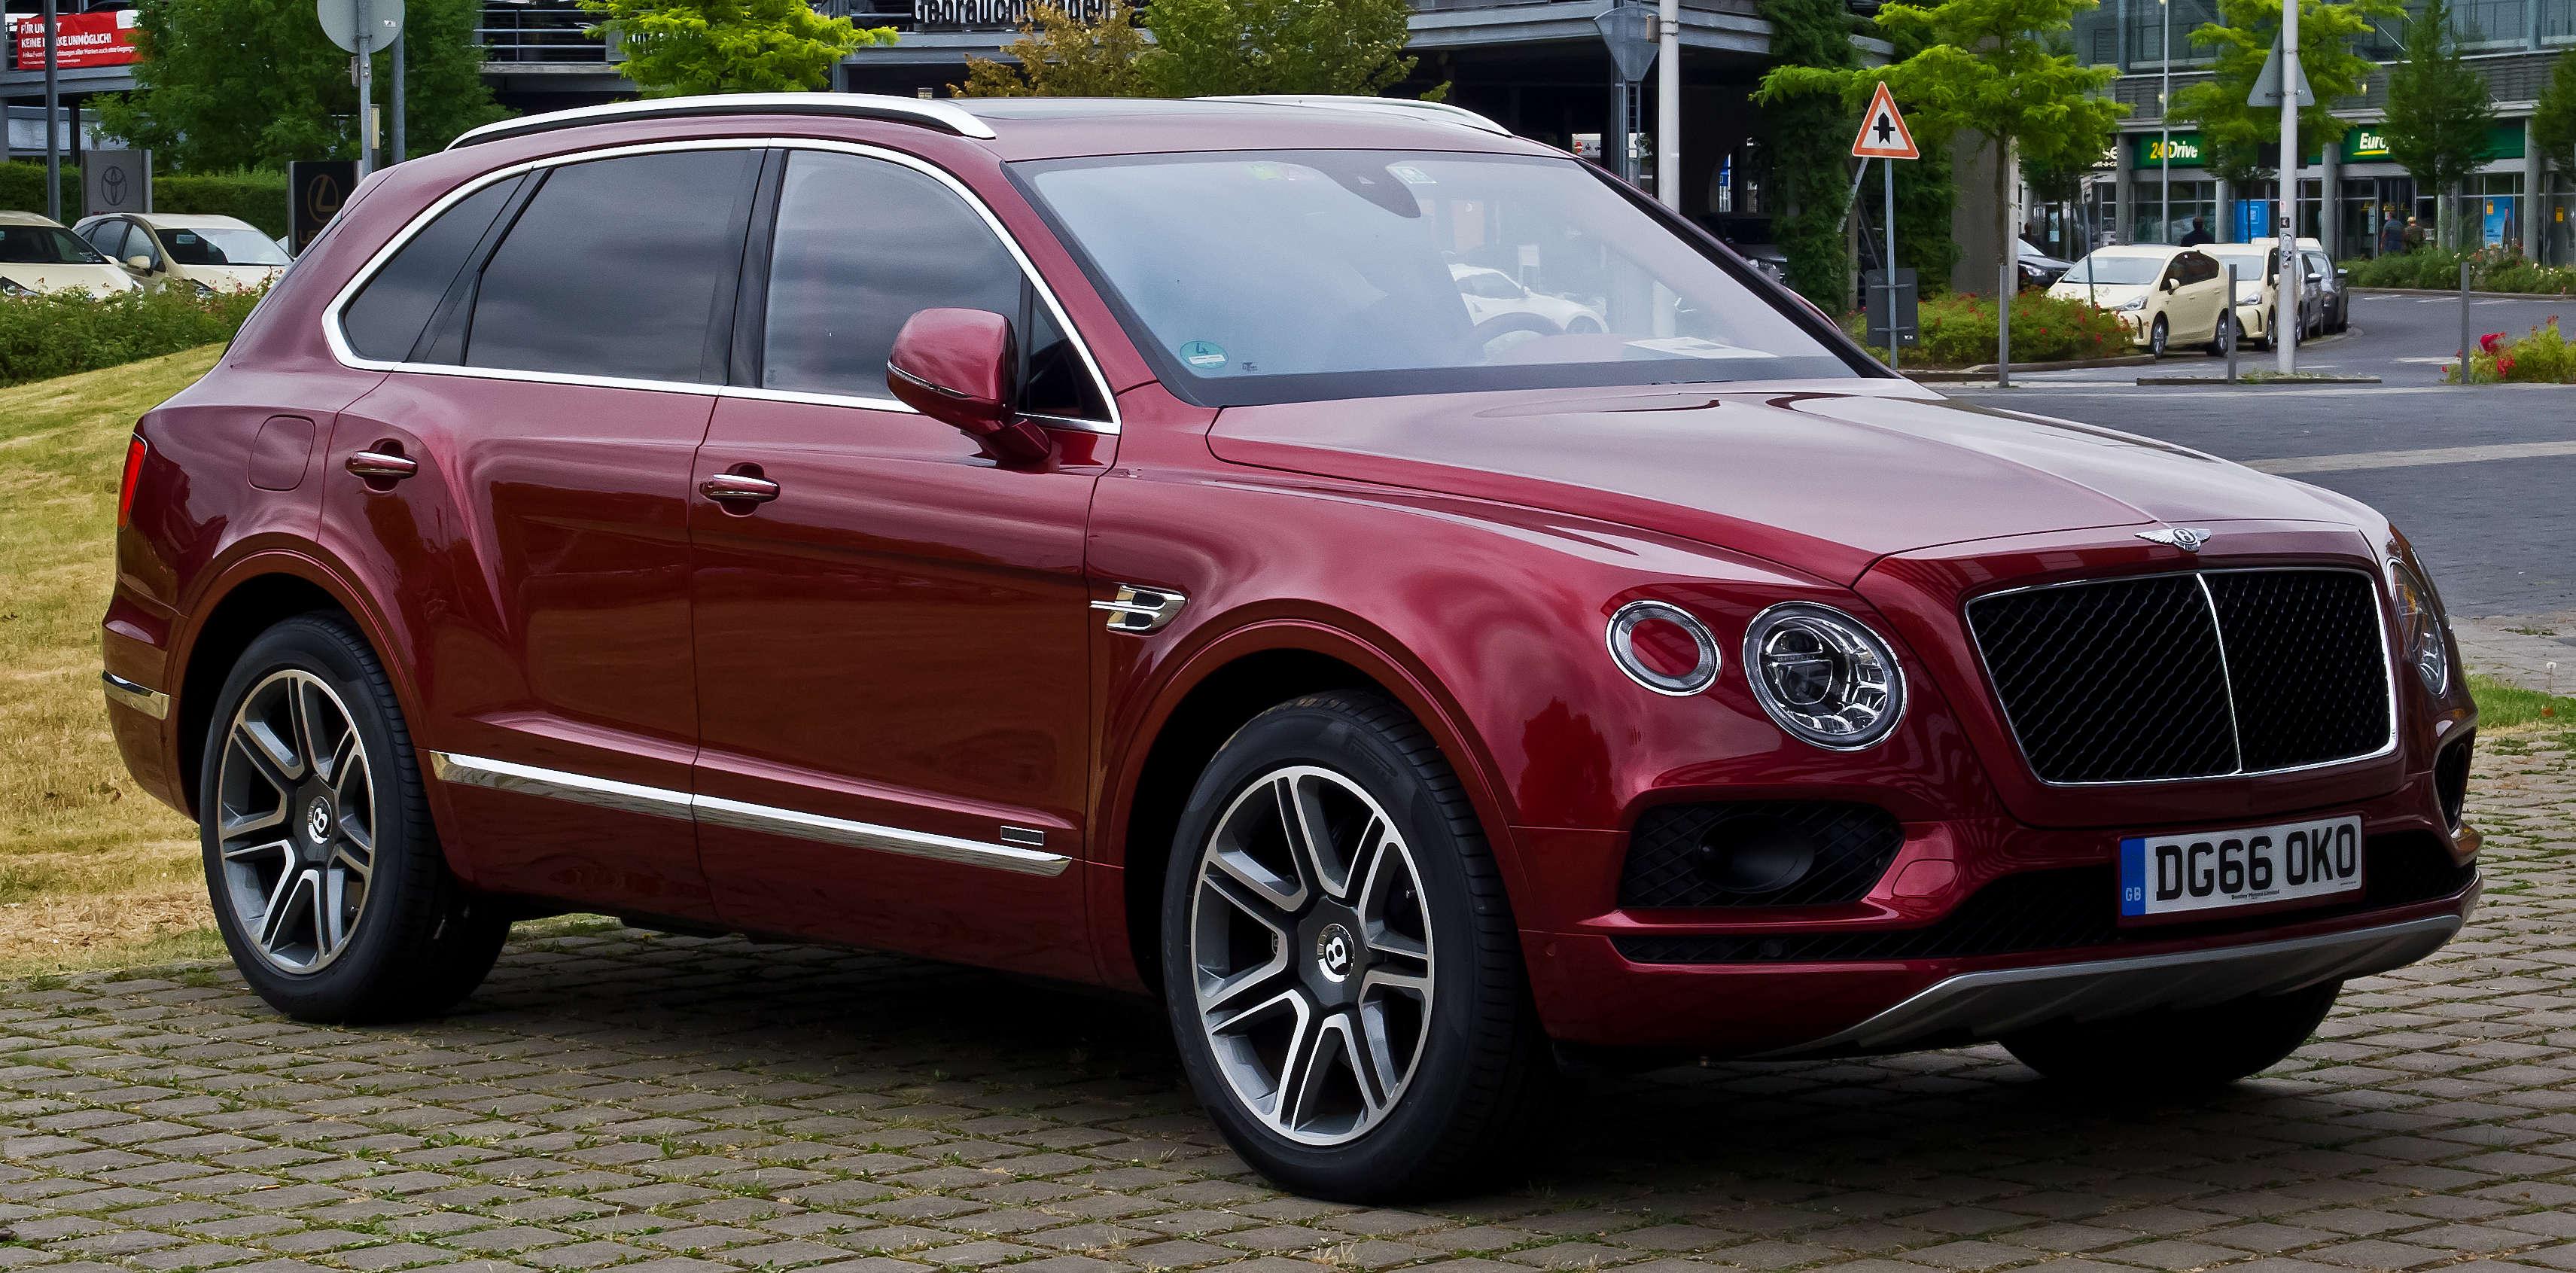 Bentley Bentayga Hybrid Bentley Launches Bentayga Hybrid Suv In Europe Auto News Et Auto